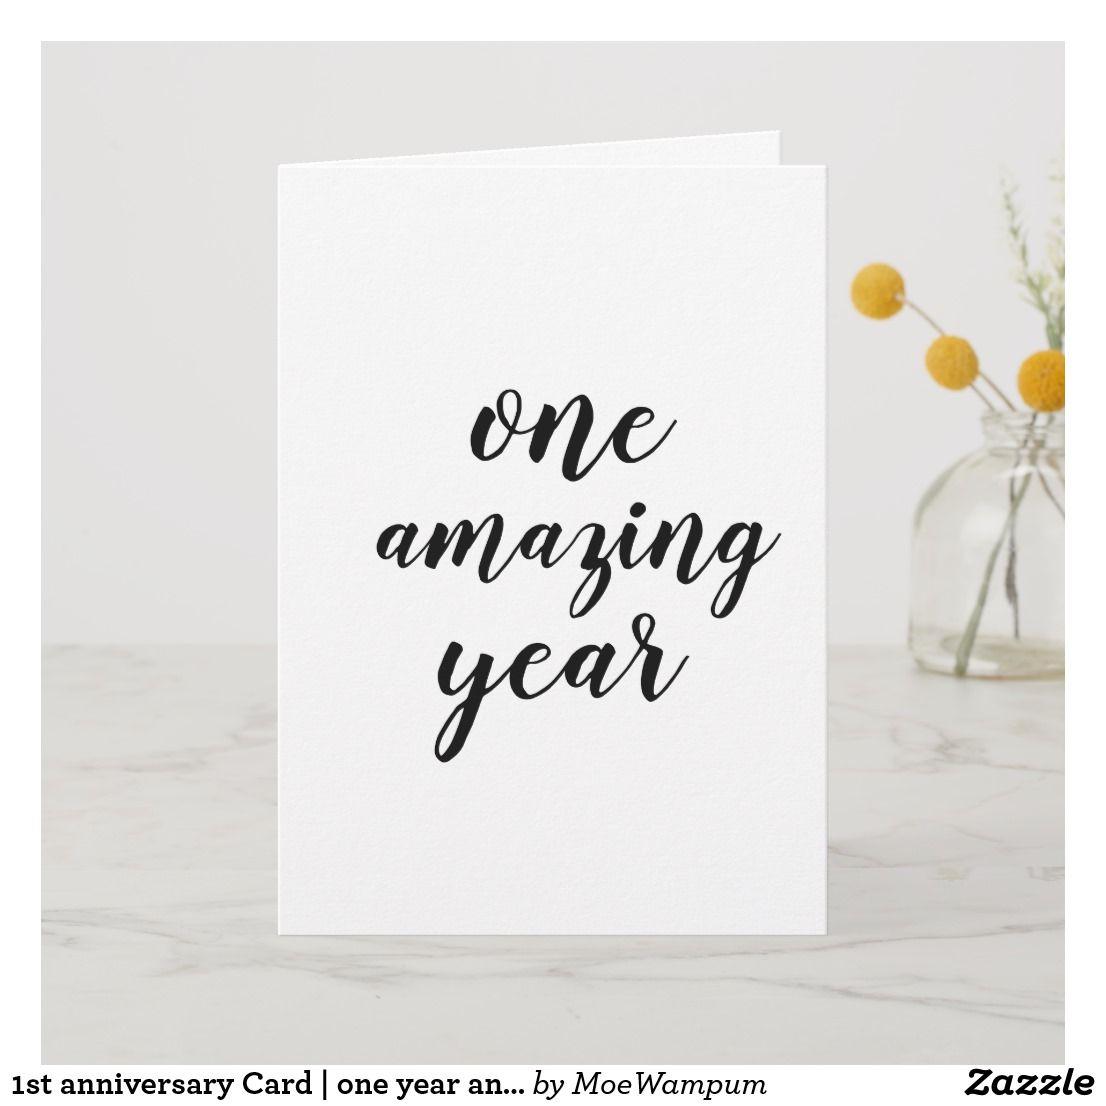 1st Anniversary Card One Year Anniversary Card Zazzle Com 1st Anniversary Cards Love Anniversary Quotes Anniversary Wishes For Boyfriend